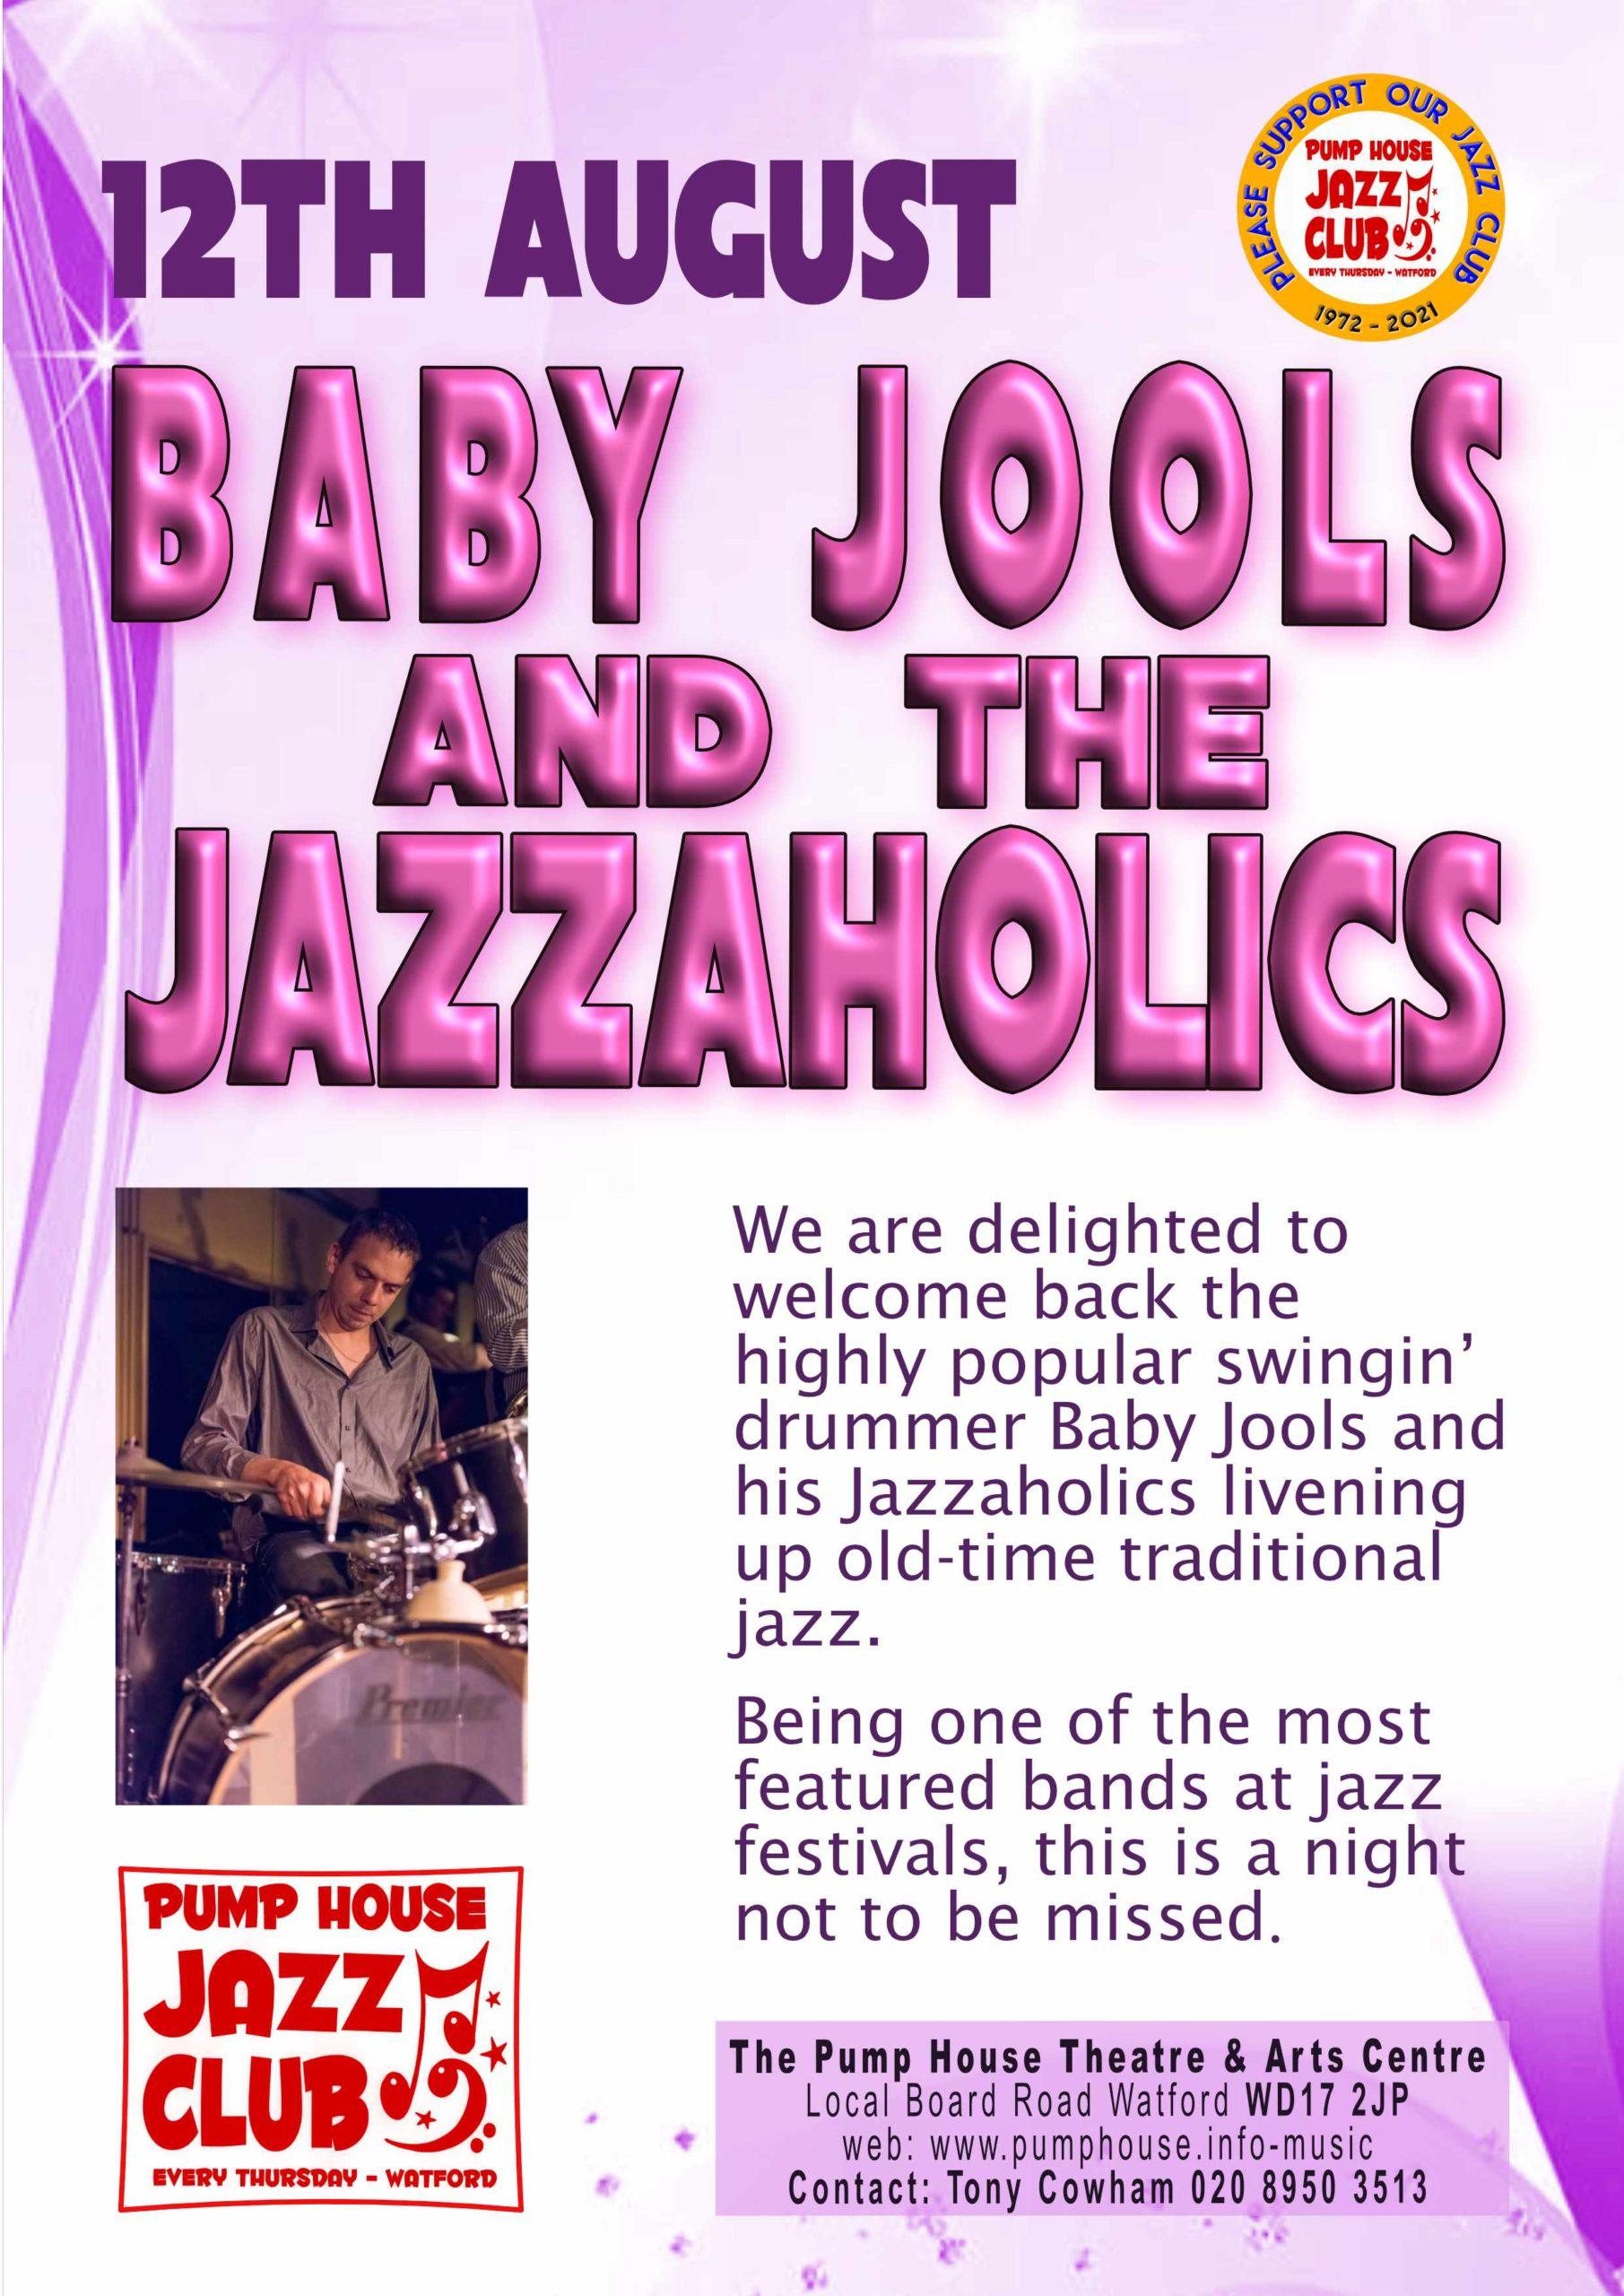 Pump House Jazz Club